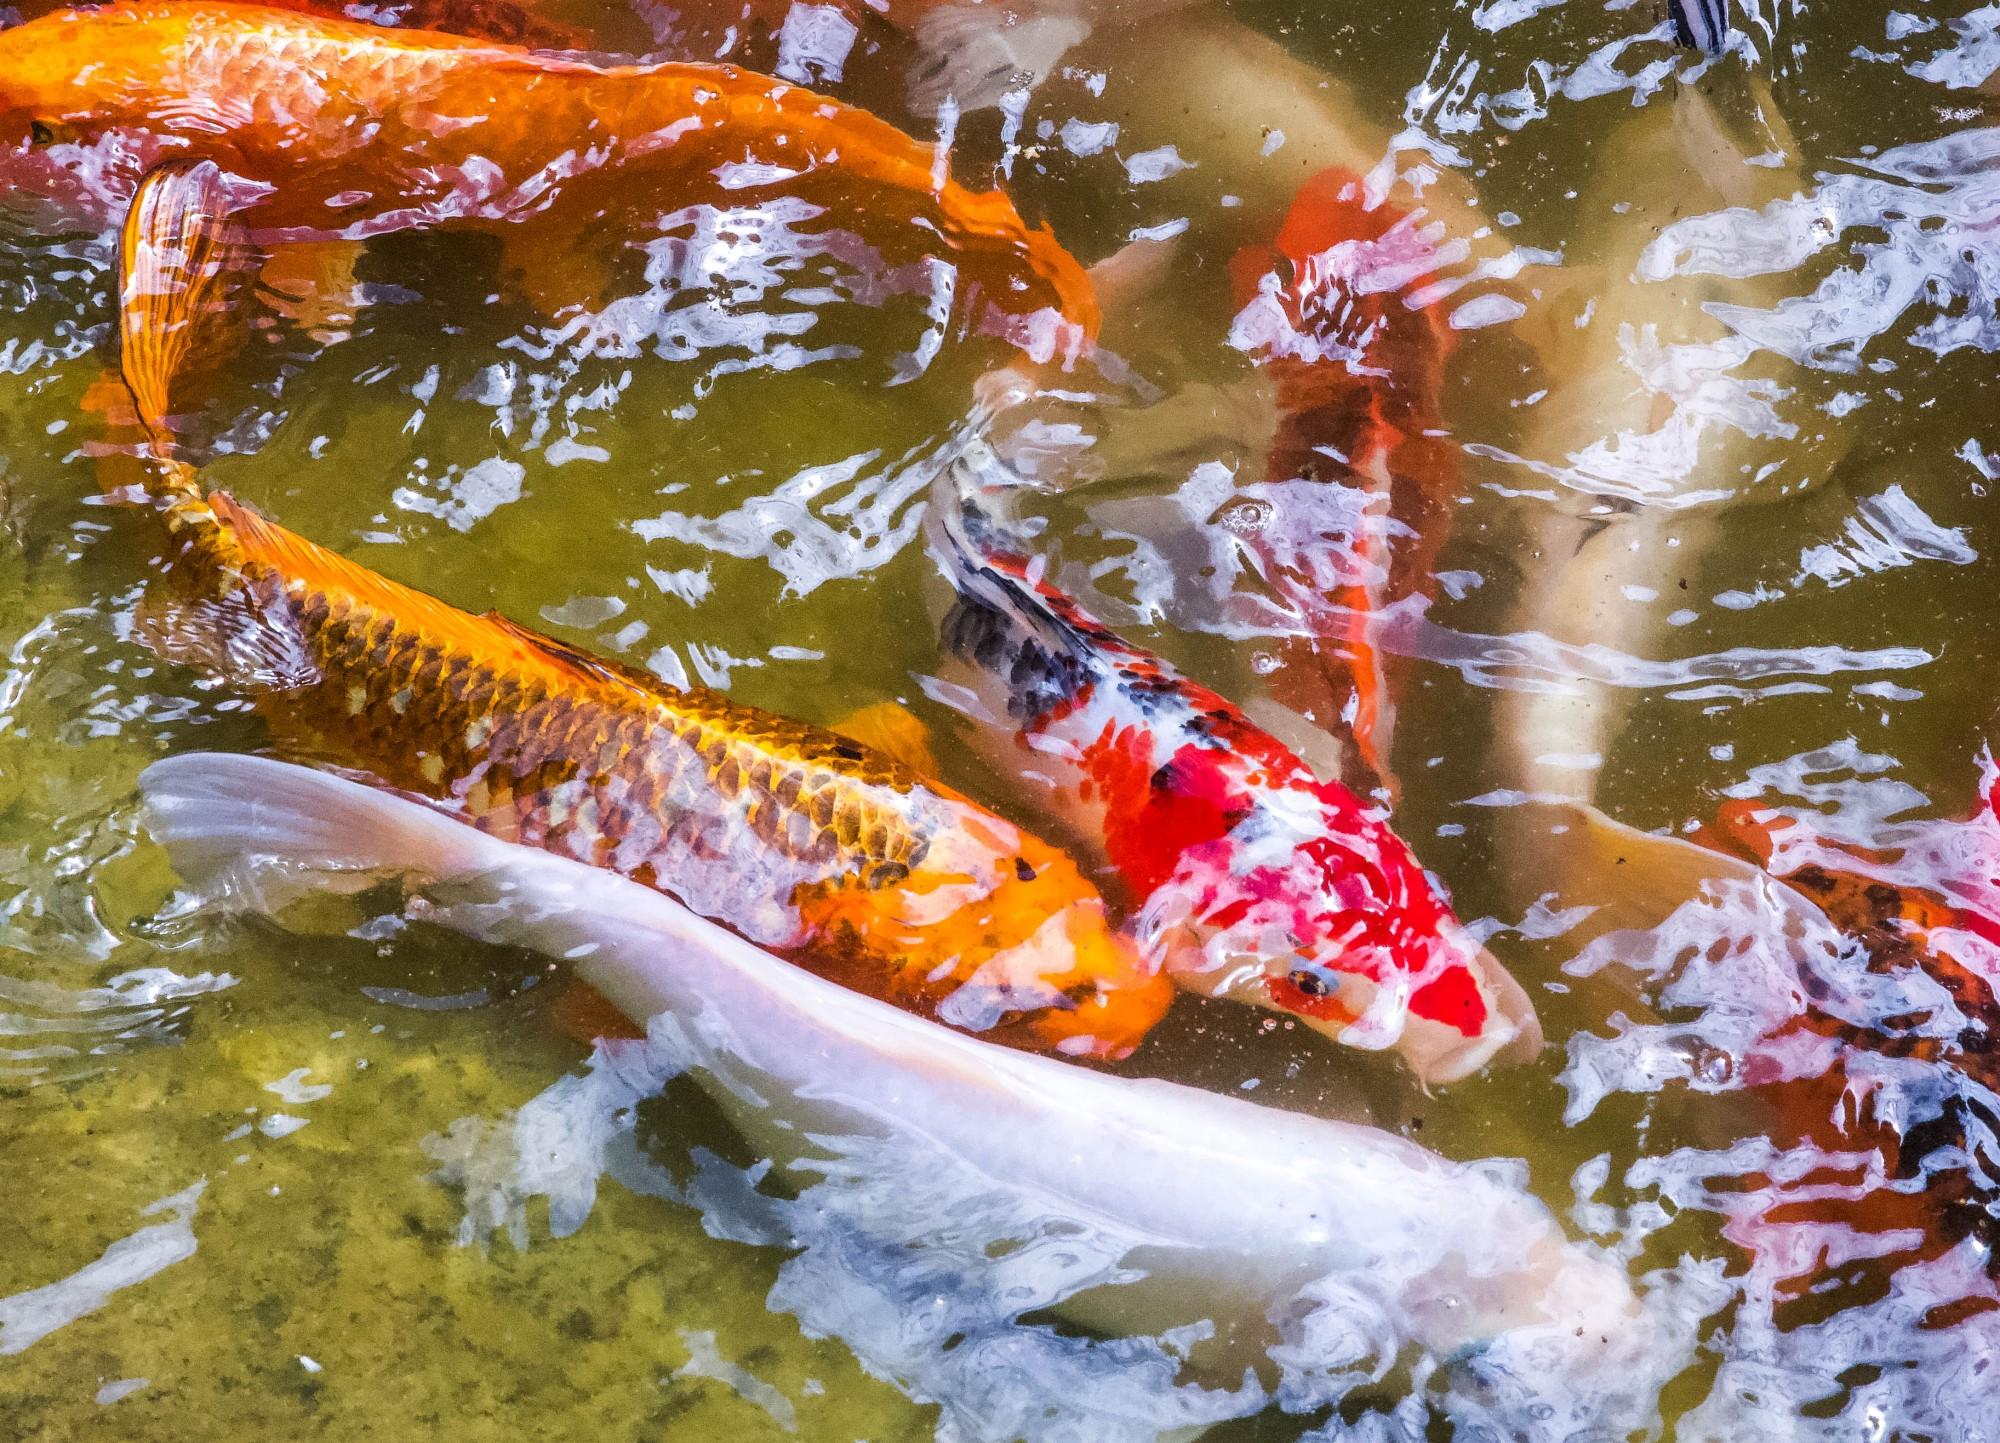 Koi fish swim in a pond near the Woodland Azalea Garden at the Minnesota Landscape Arboretum in Chaska on Monday, July 13.